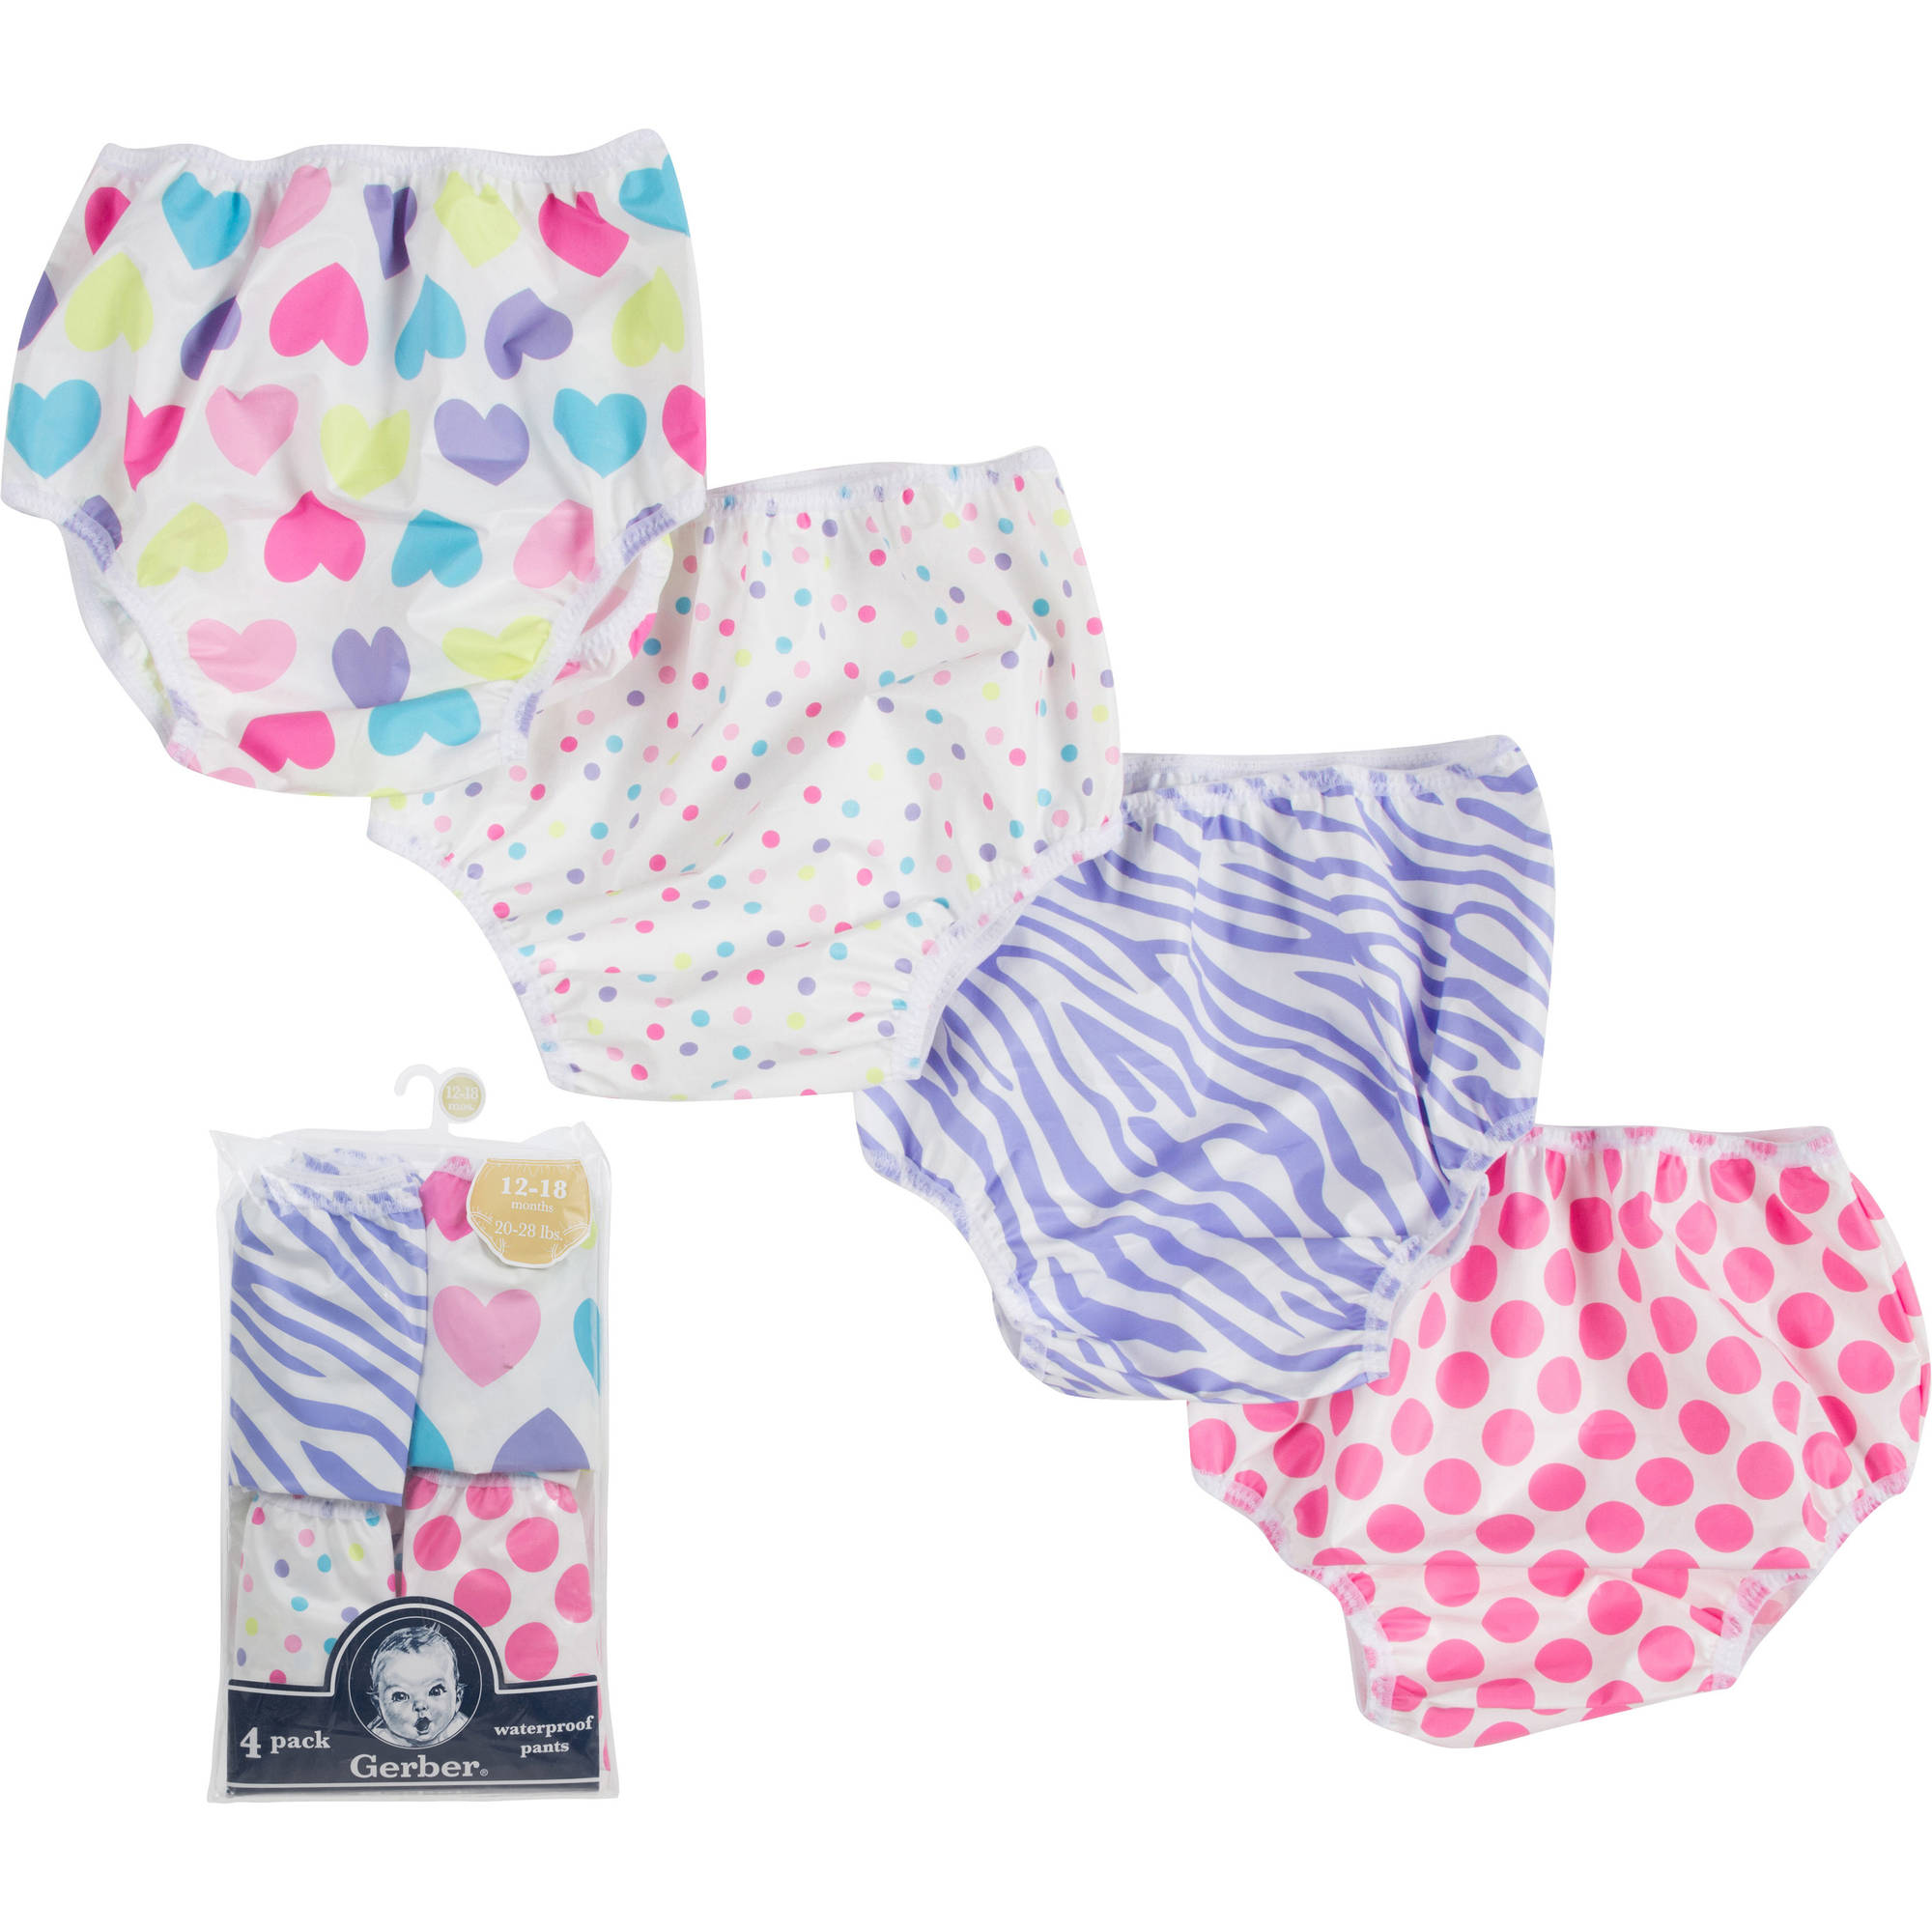 Gerber Baby Toddler Girl Waterproof Training Pant Covers,4-Pack Assorted